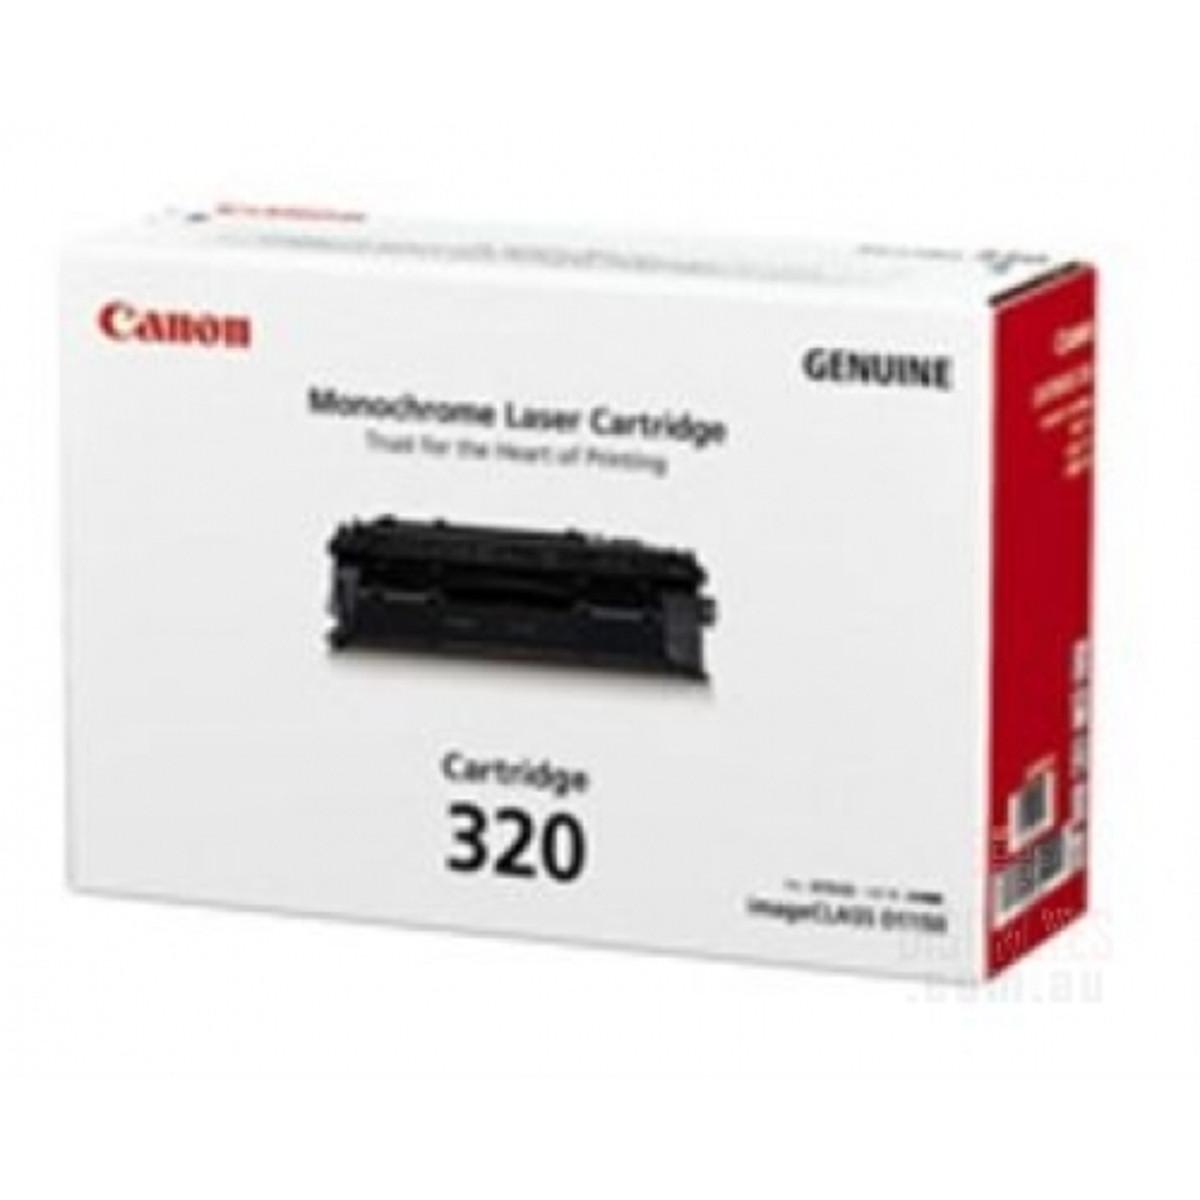 Canon CART-320 Black Toner Cartridge